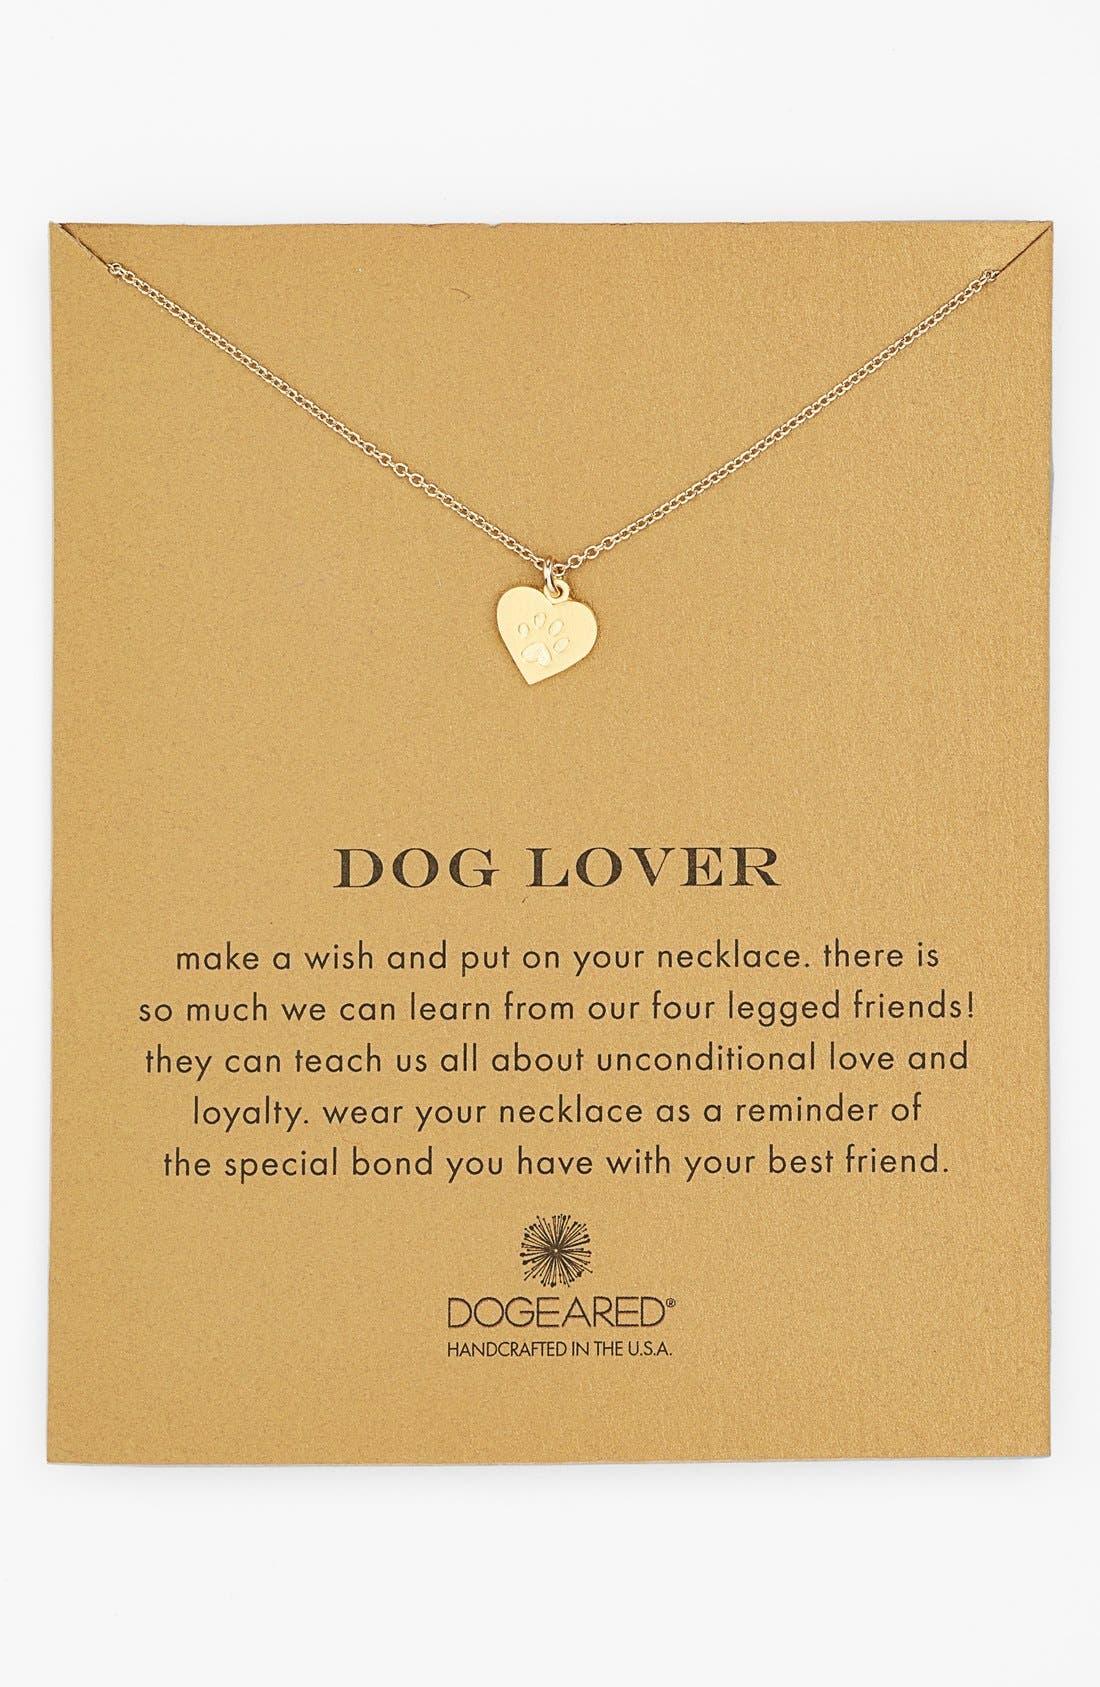 Alternate Image 1 Selected - Dogeared 'Reminder - Dog Lover' Boxed Pendant Necklace